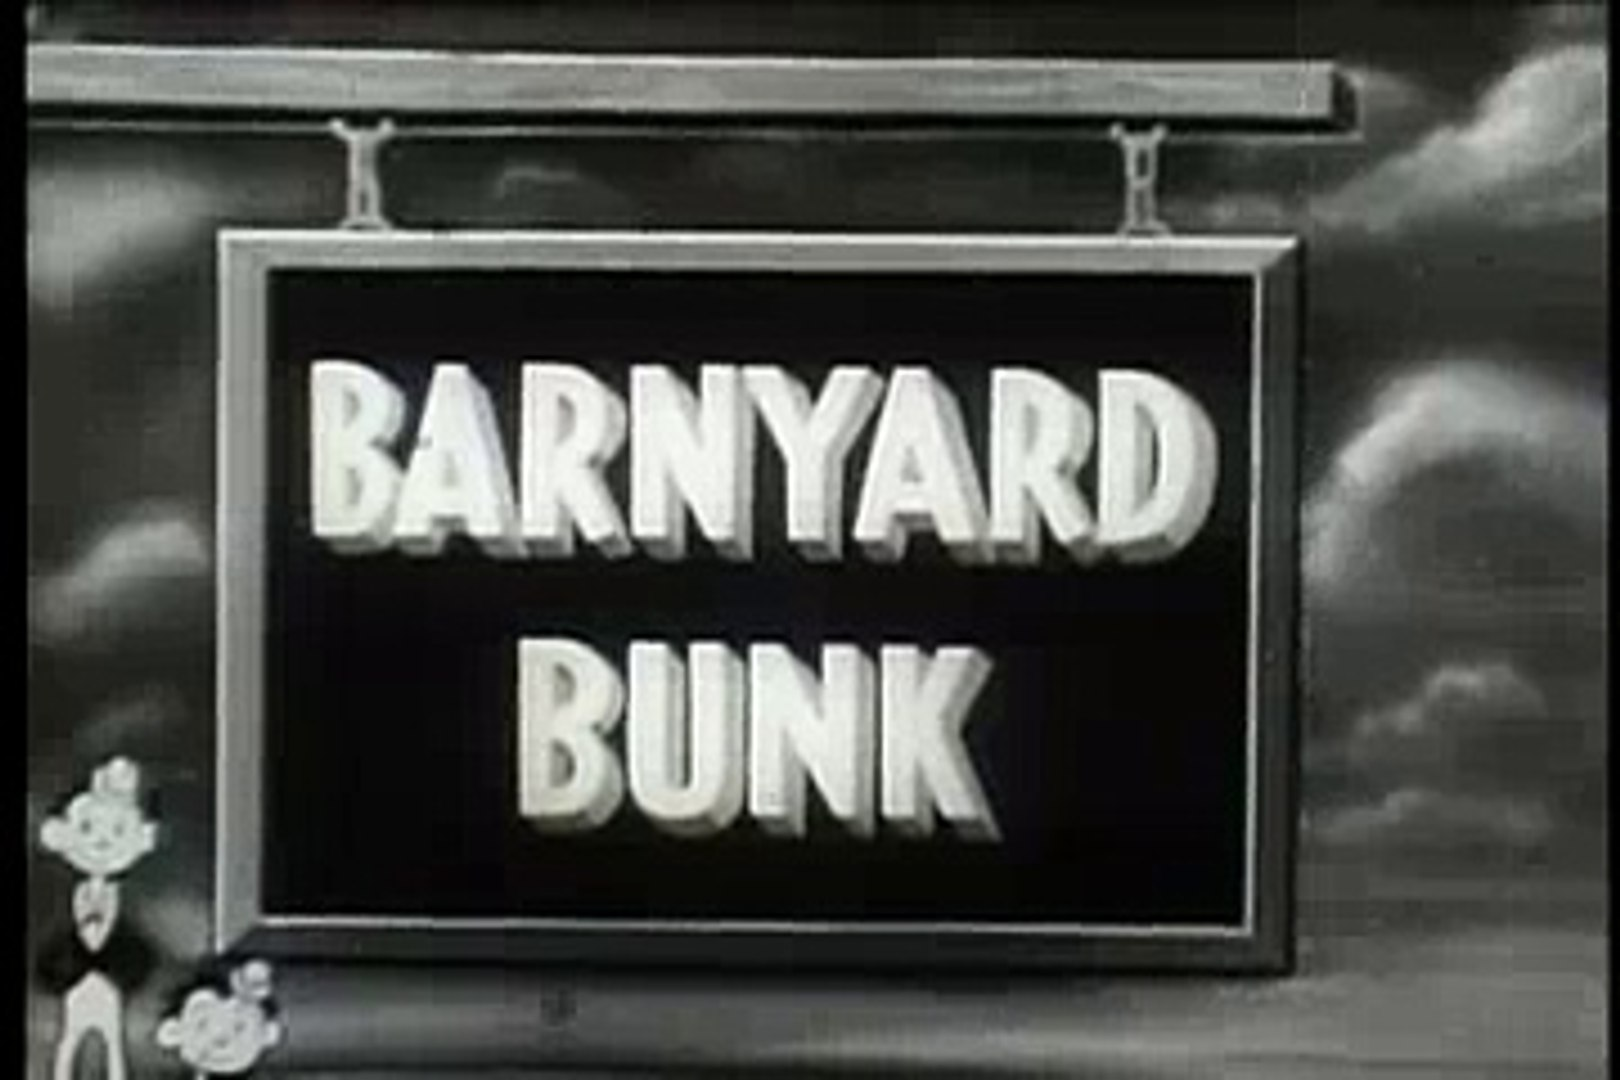 Tom and jerry barnyard bunk 1932